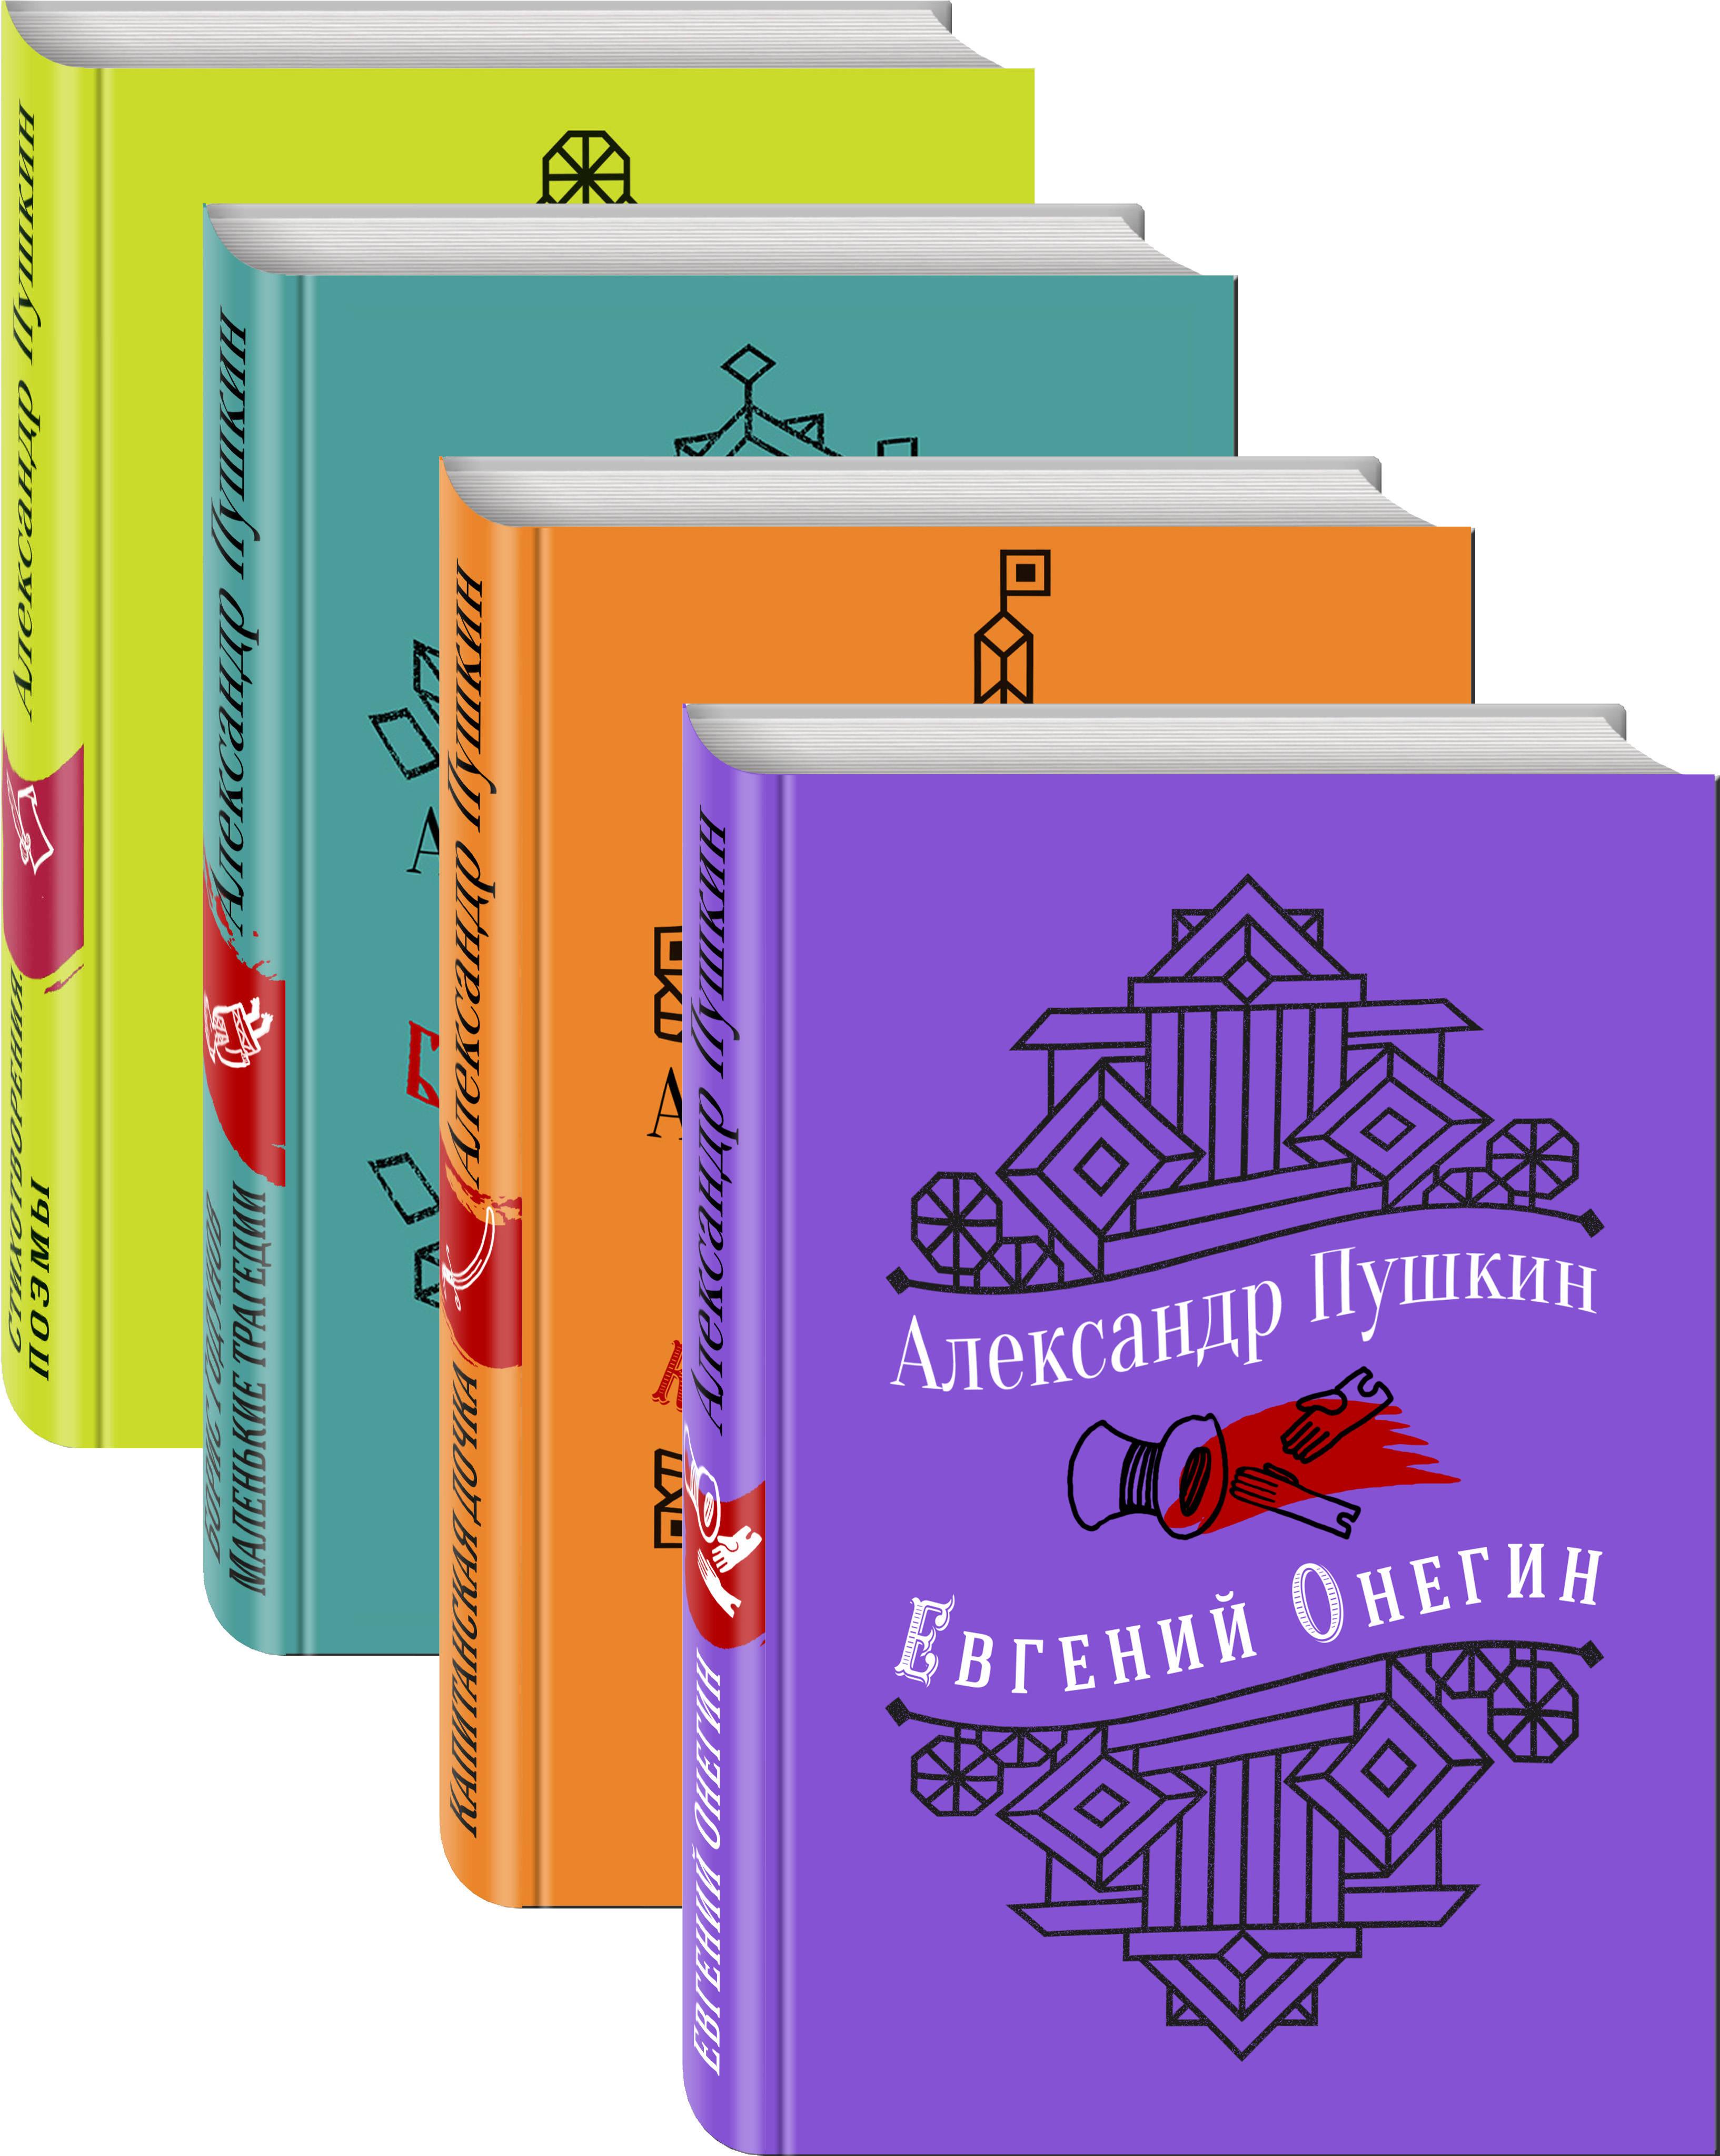 Юбилейное издание А.С. Пушкина с иллюстрациями (комплект из 4 книг)